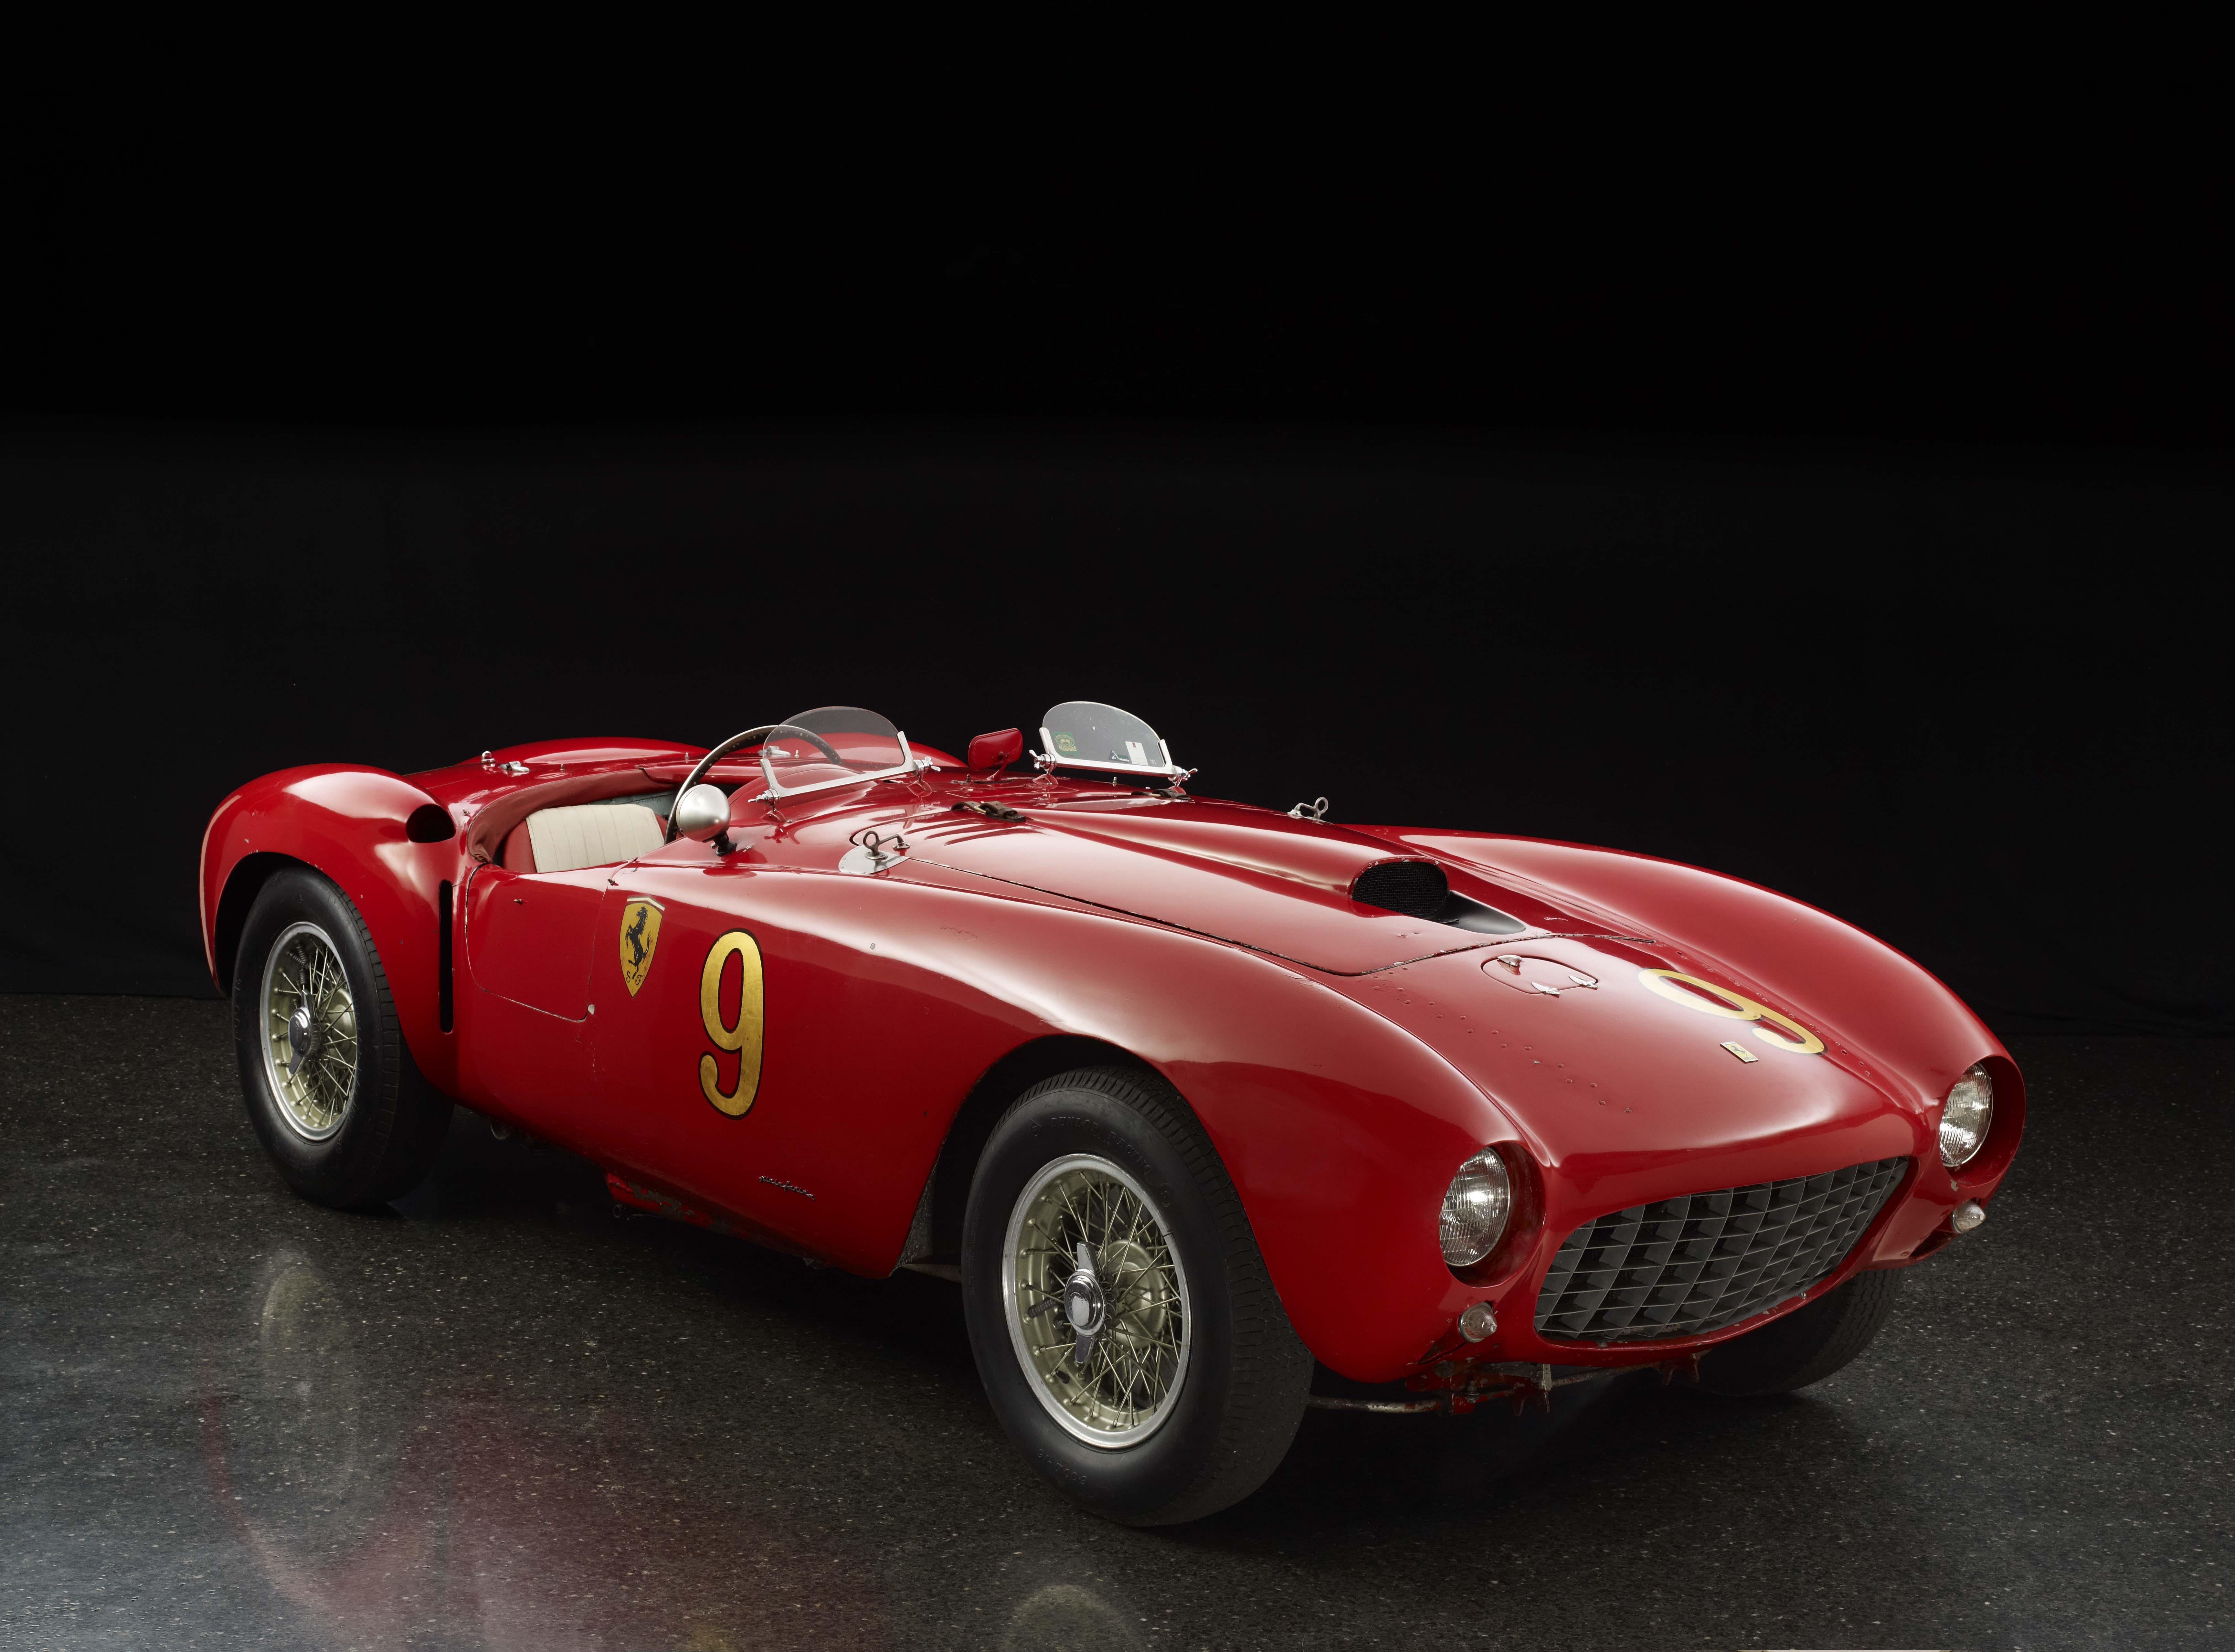 1953 Ferrari 375 MM Spyder by Pinin Farina: The Quail, A Motorsports Gathering